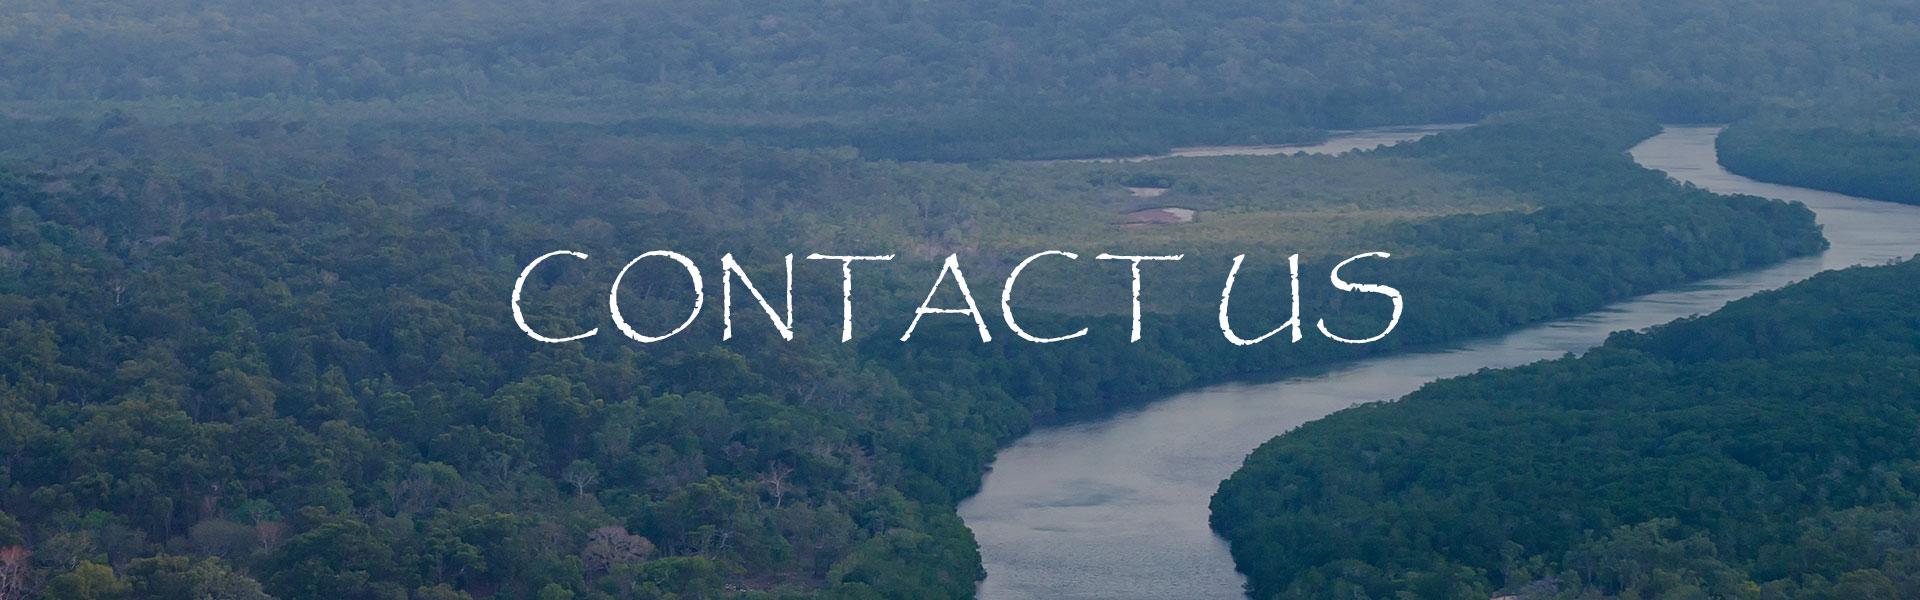 Contact Rainforest Relics